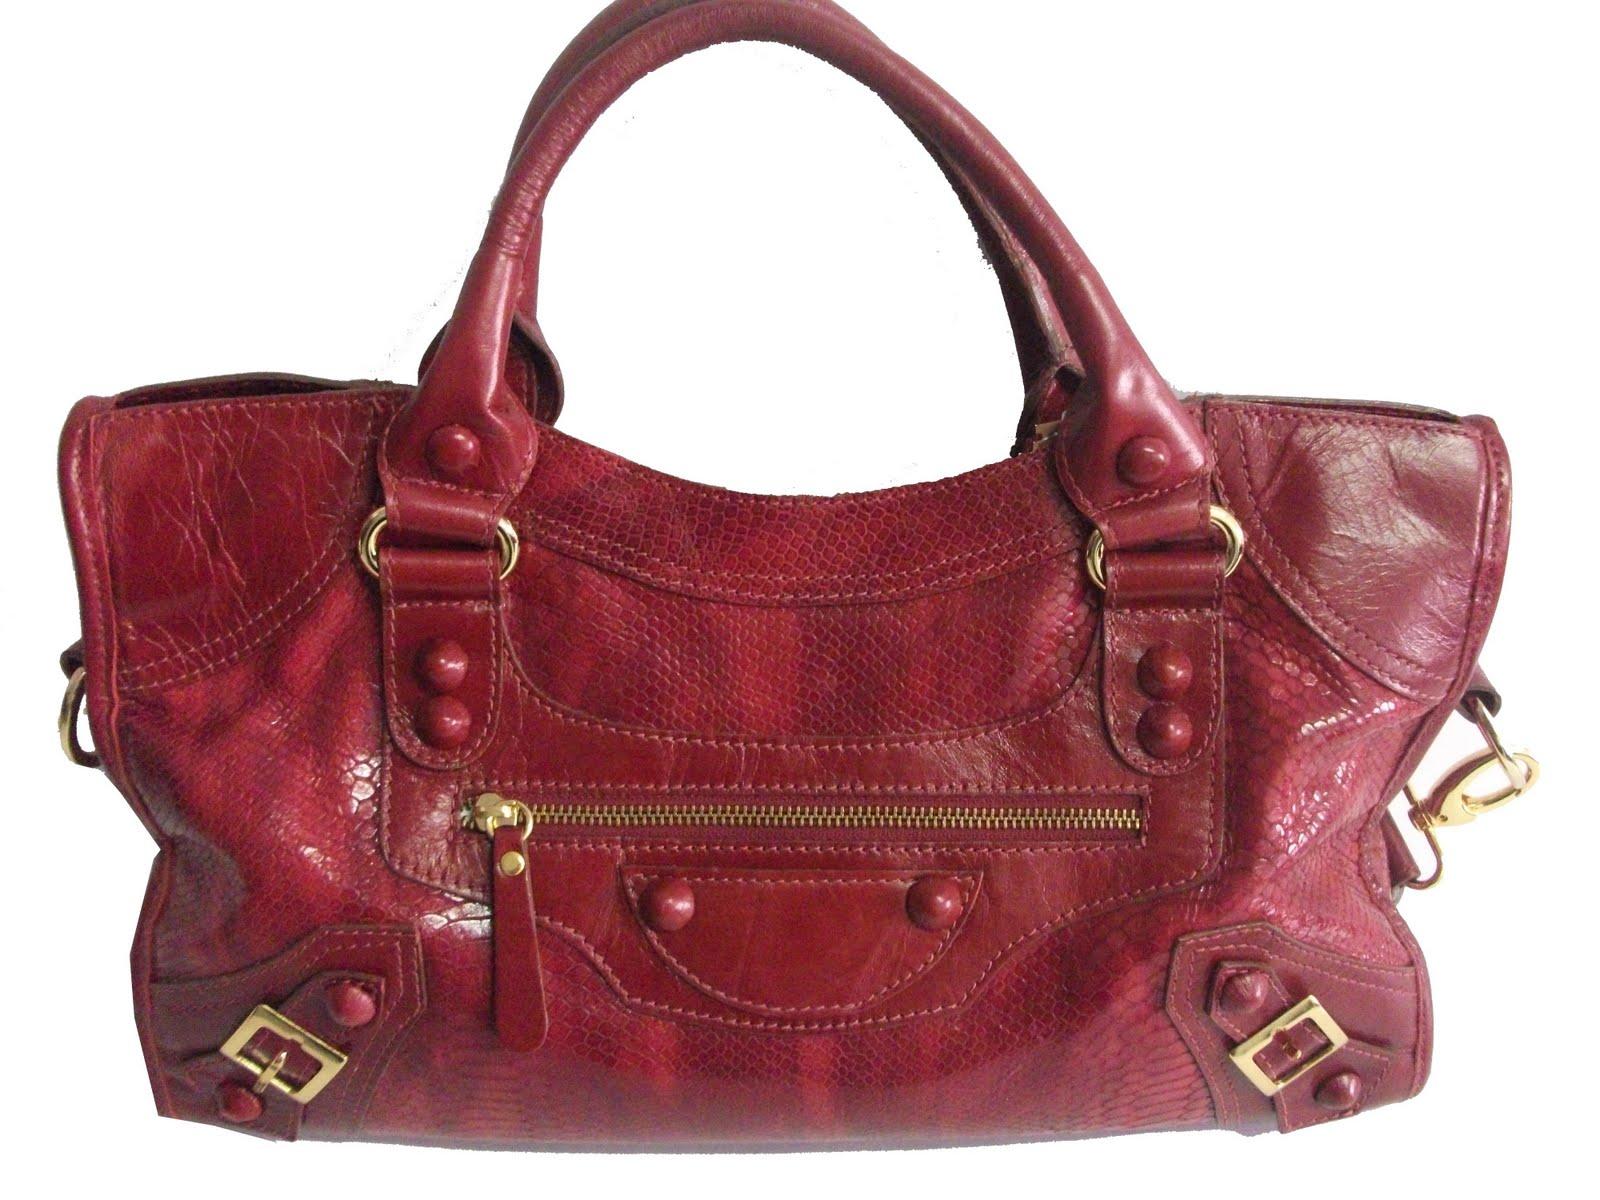 Bolsa De Couro Wow : Bolsas de couro femininas varias marcas e modelos